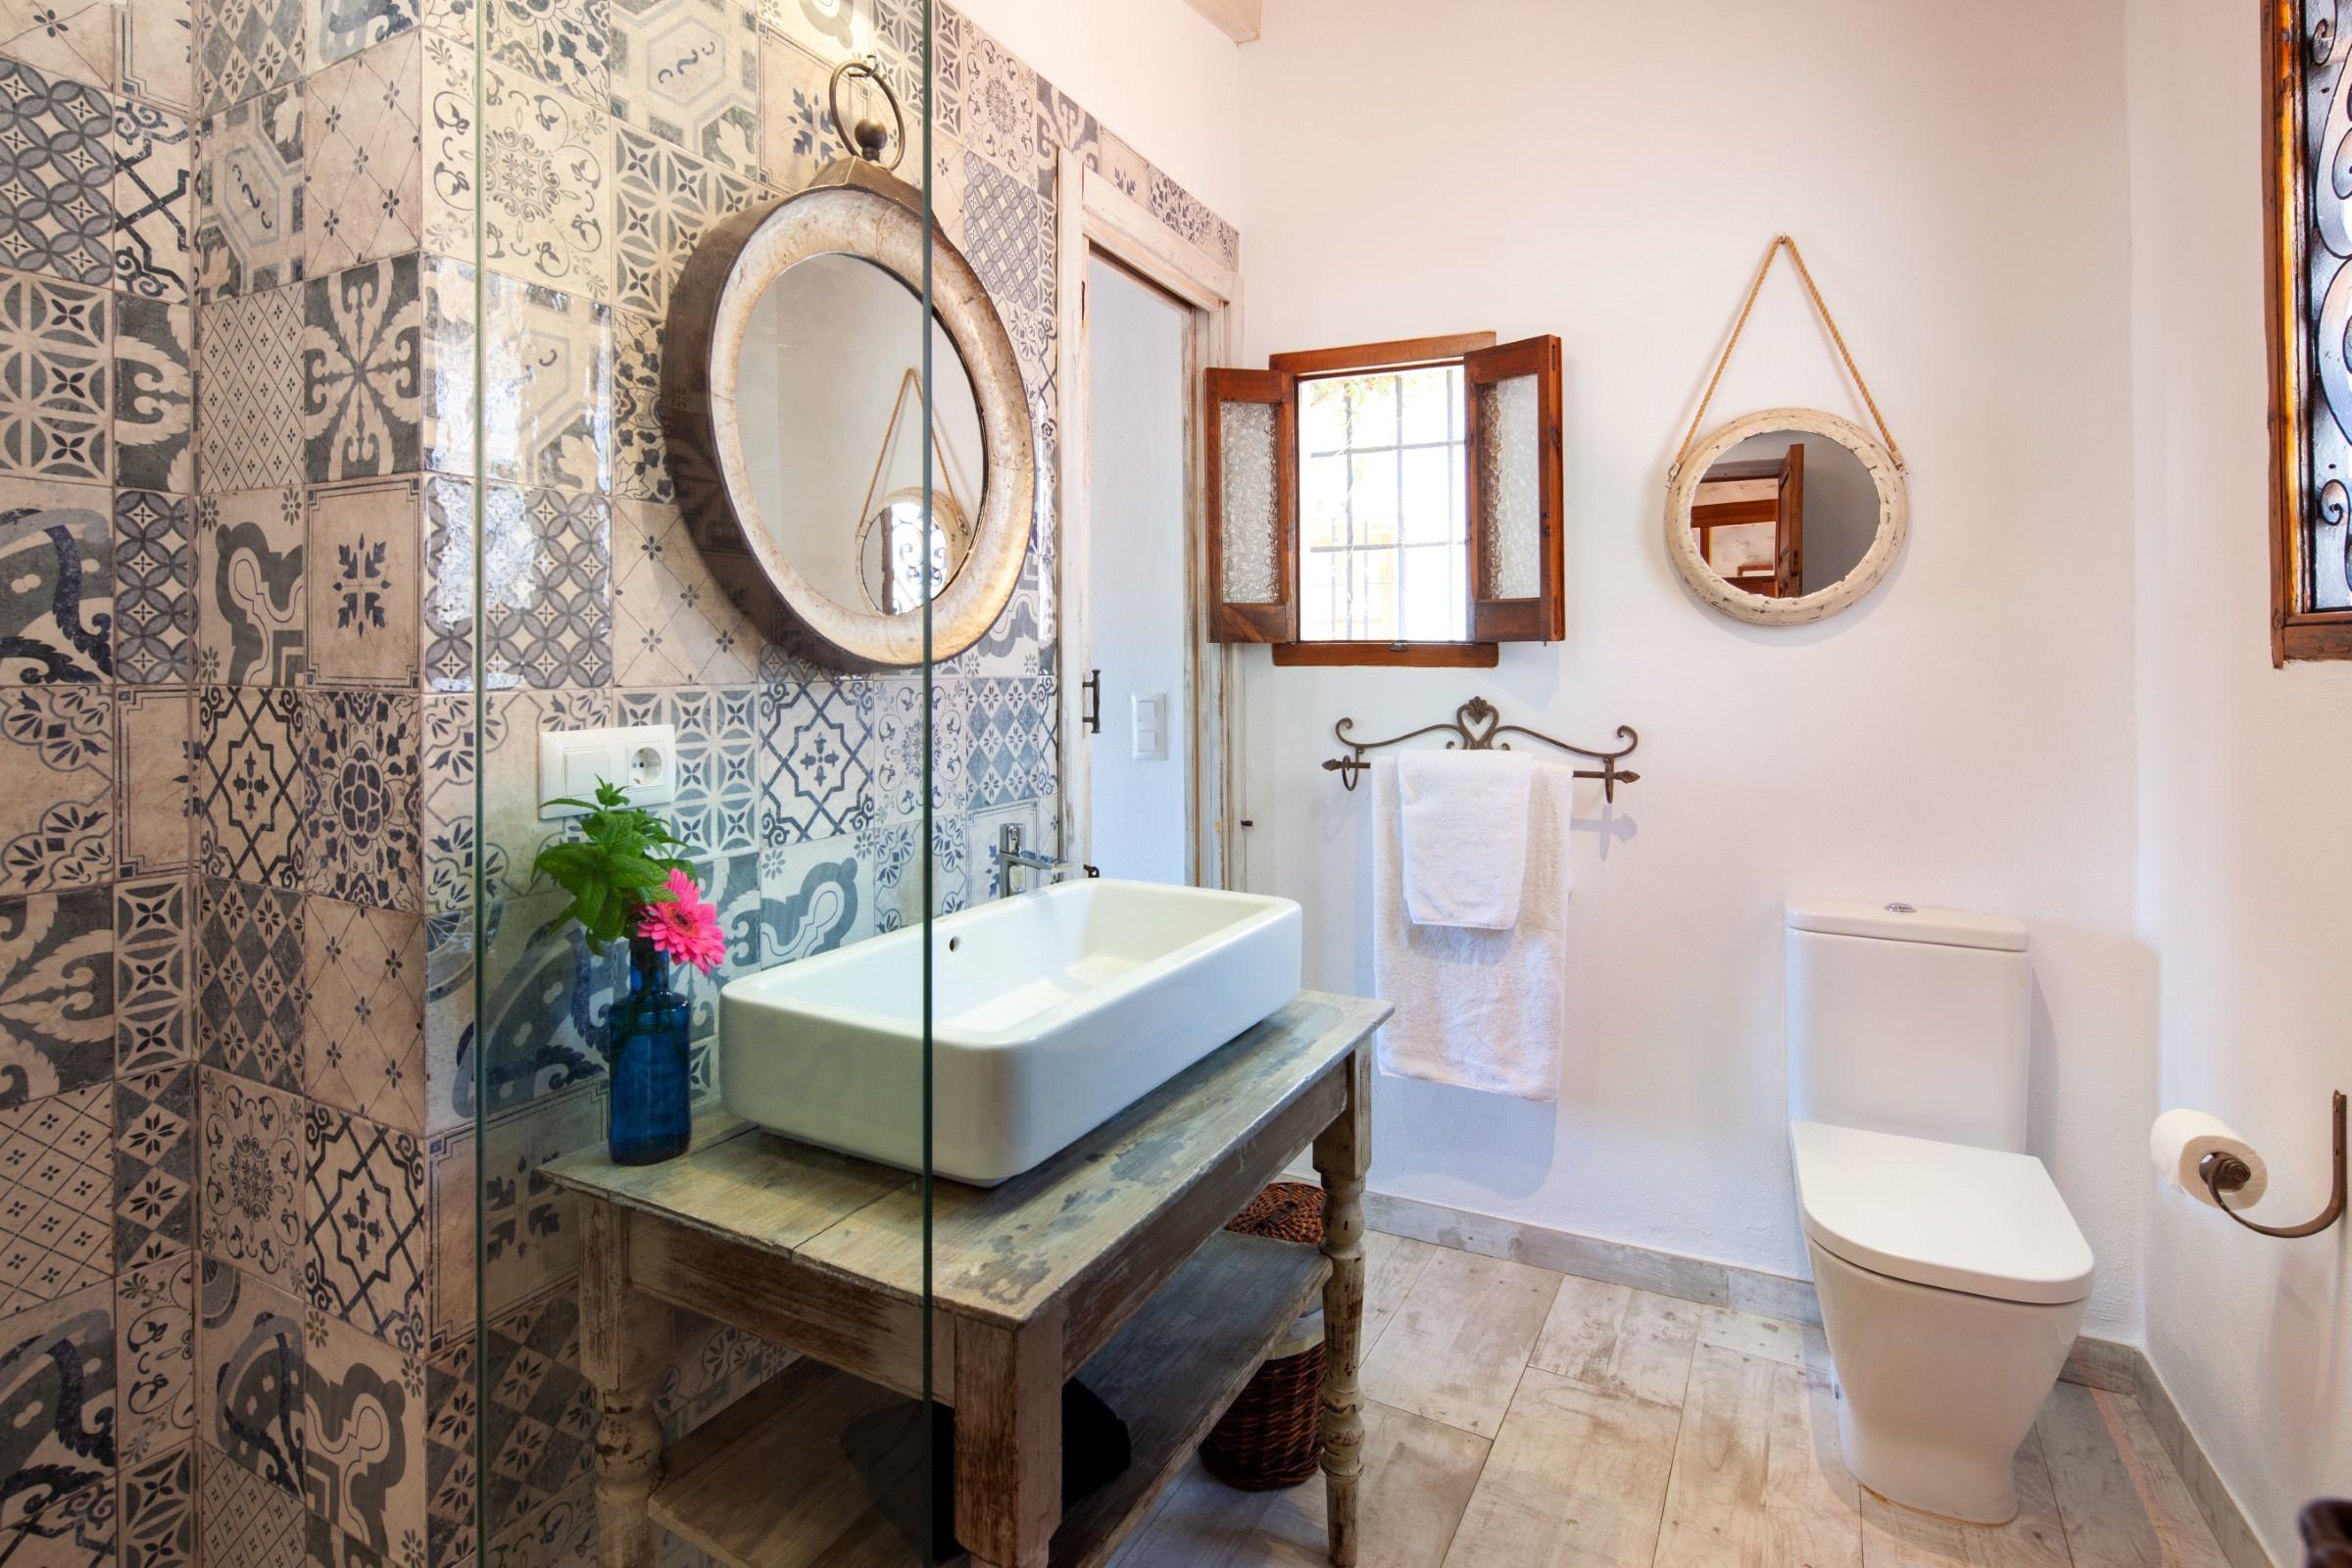 segundo cuarto de baño con ducha